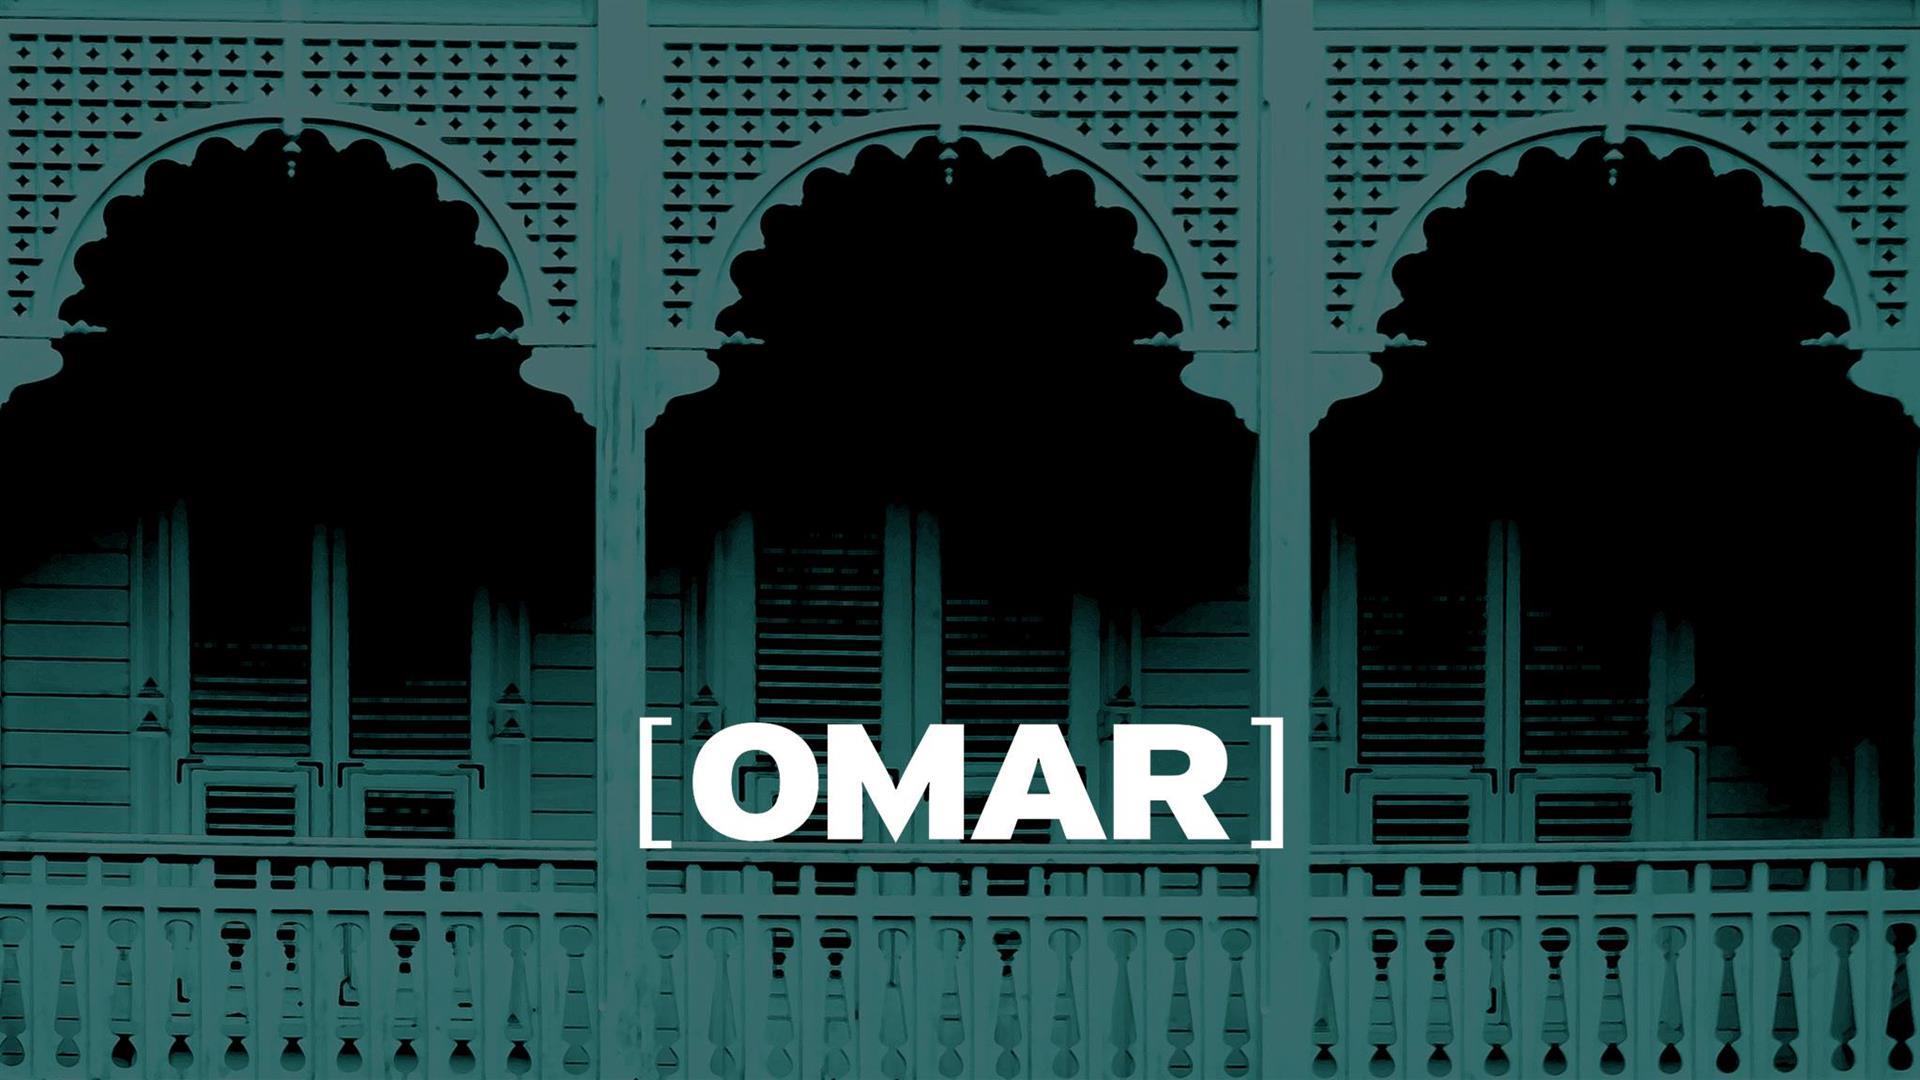 omar summer-school yaz-okulu kazananlar applicants